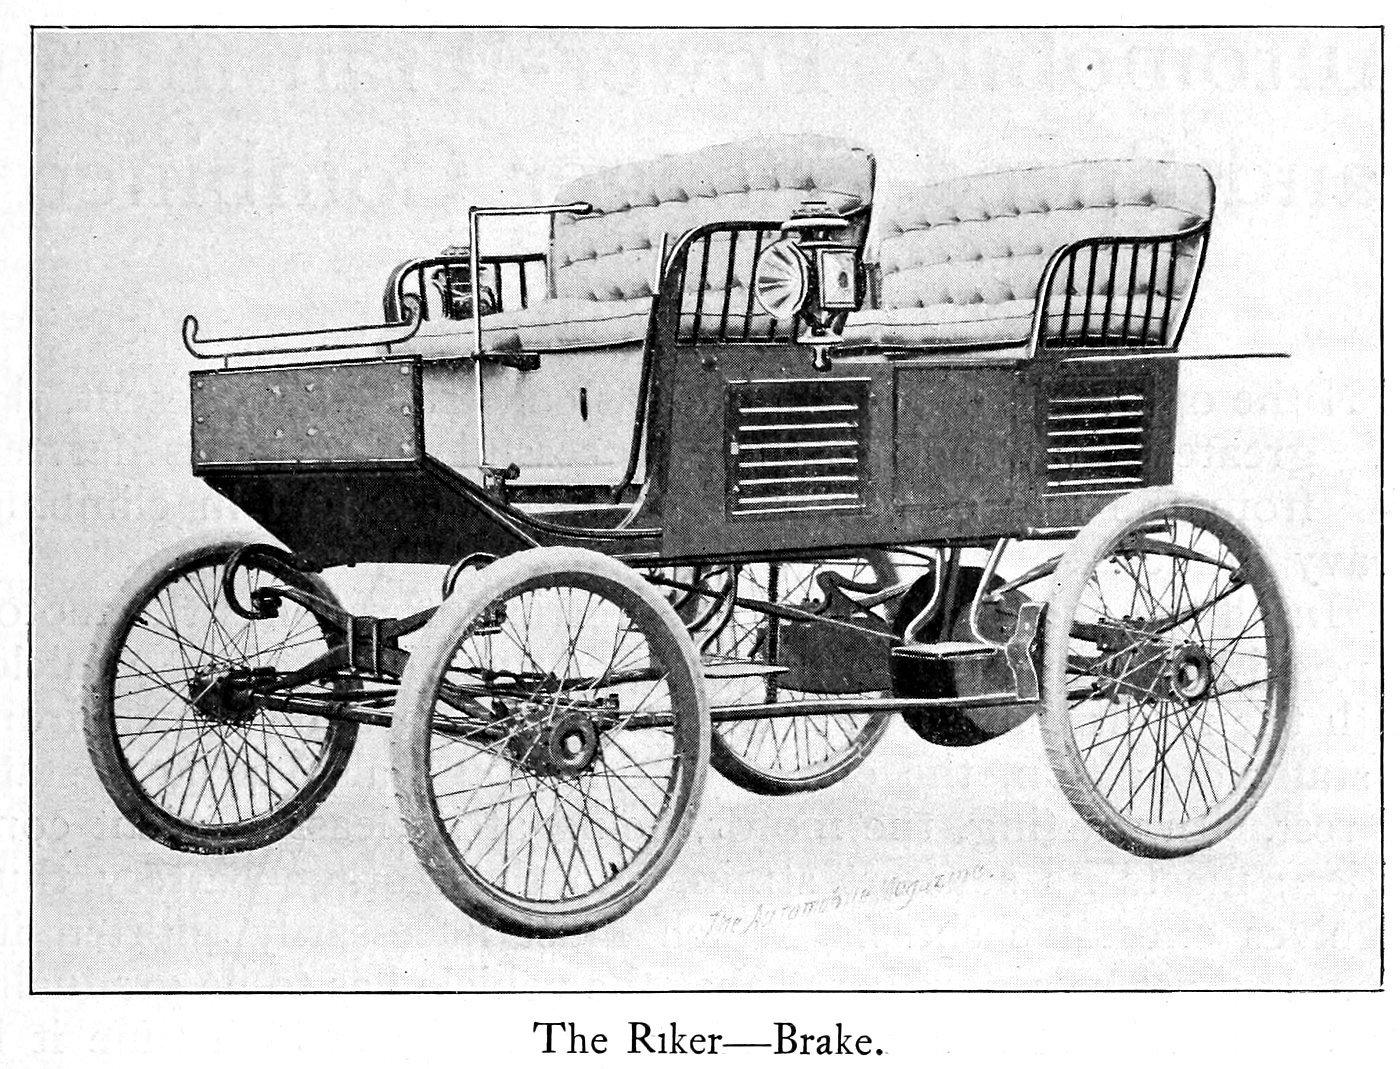 The Riker -- Brake (1899)